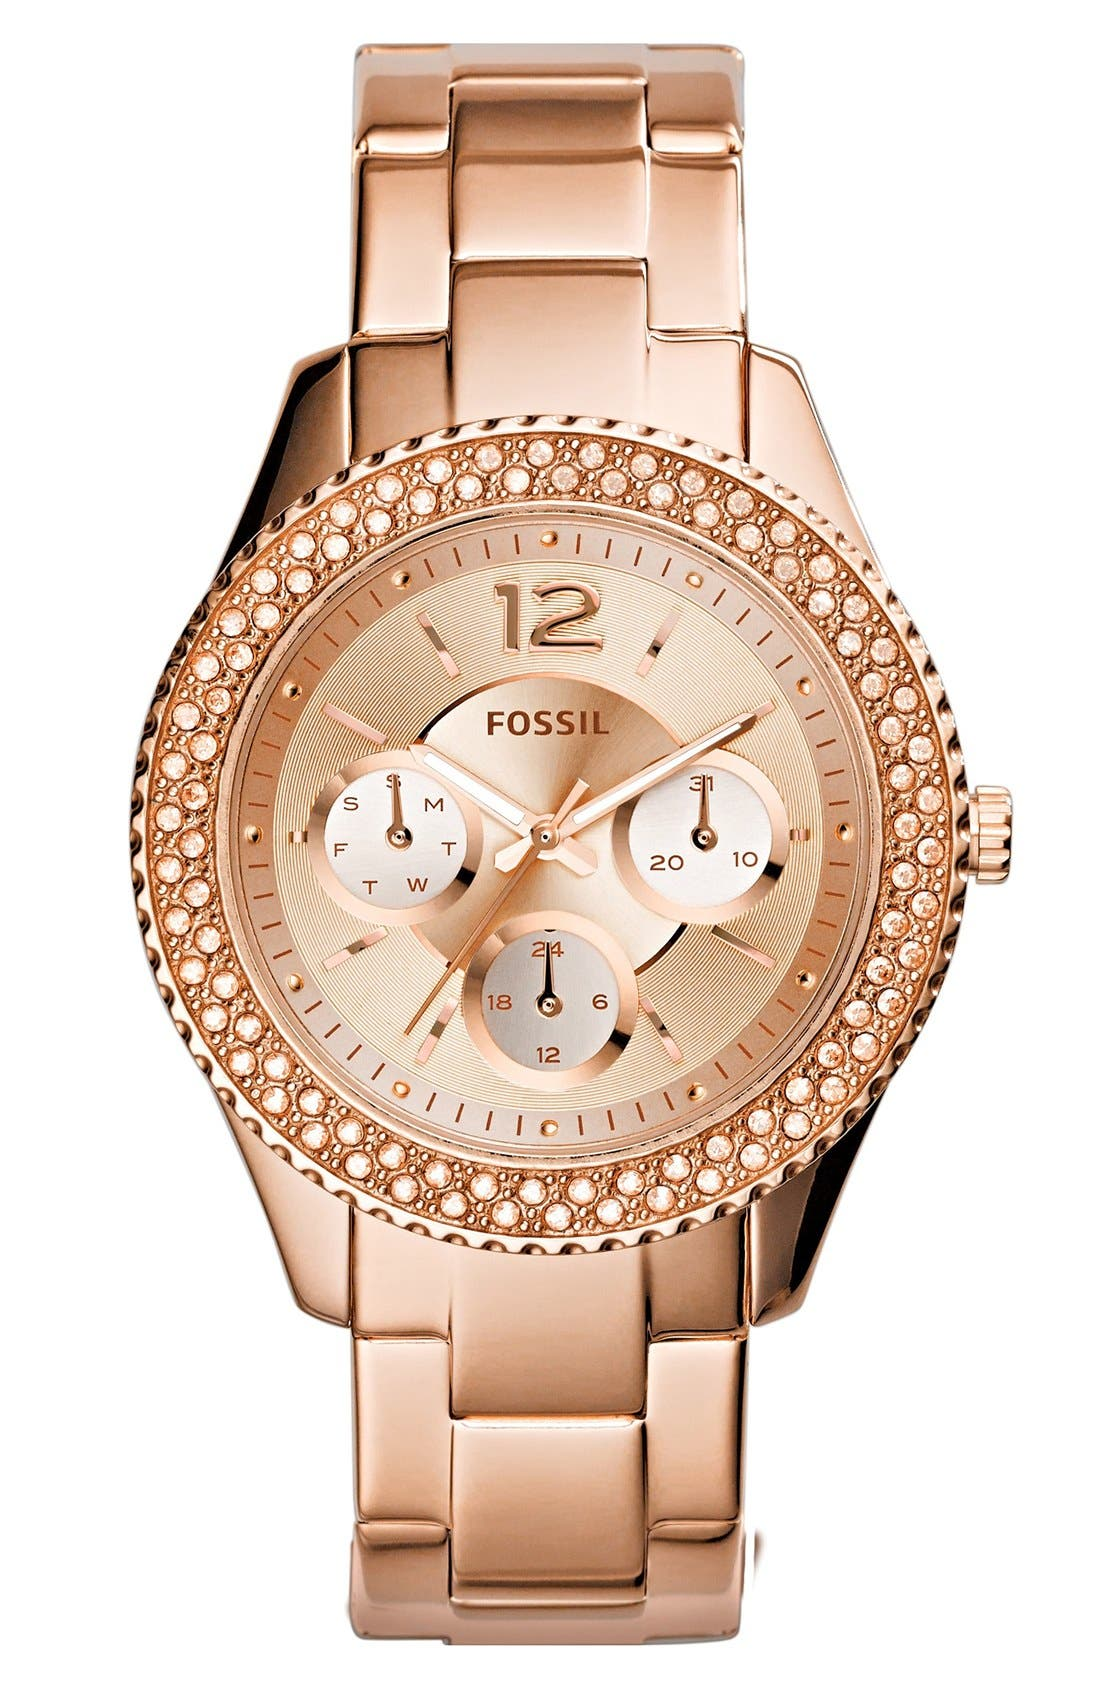 FOSSIL 'Stella' Crystal Bezel Multifunction Bracelet Watch, 38mm, Main, color, ROSE GOLD